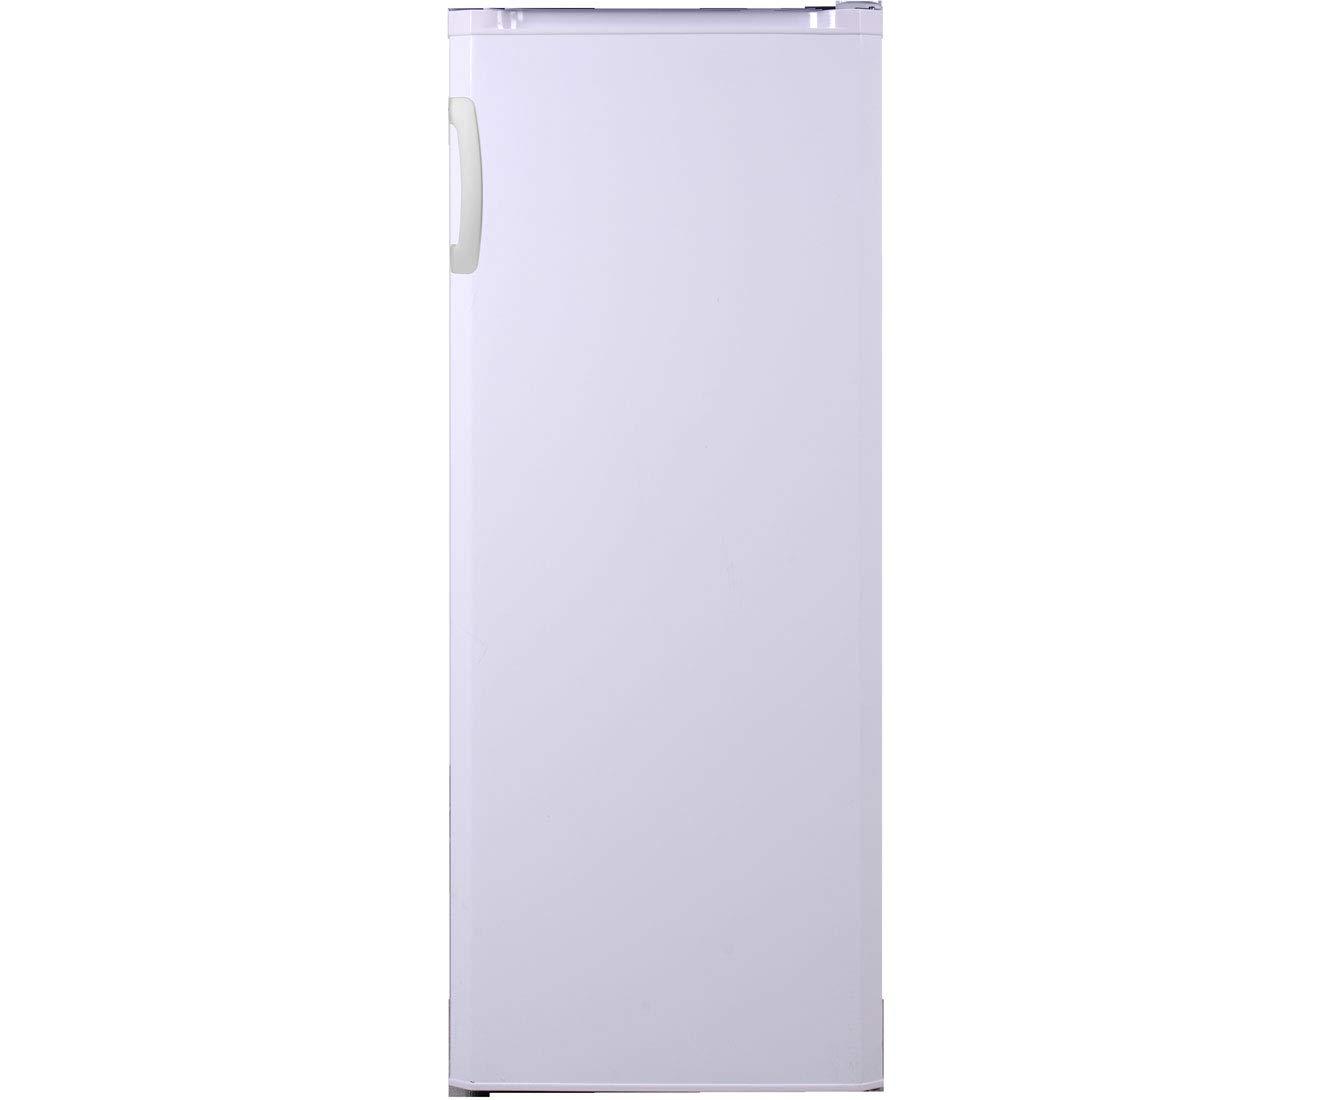 Amica Kühlschrank Produktion : Amica vks 354 100 w kühlschrank weiß: amazon.de: elektro großgeräte